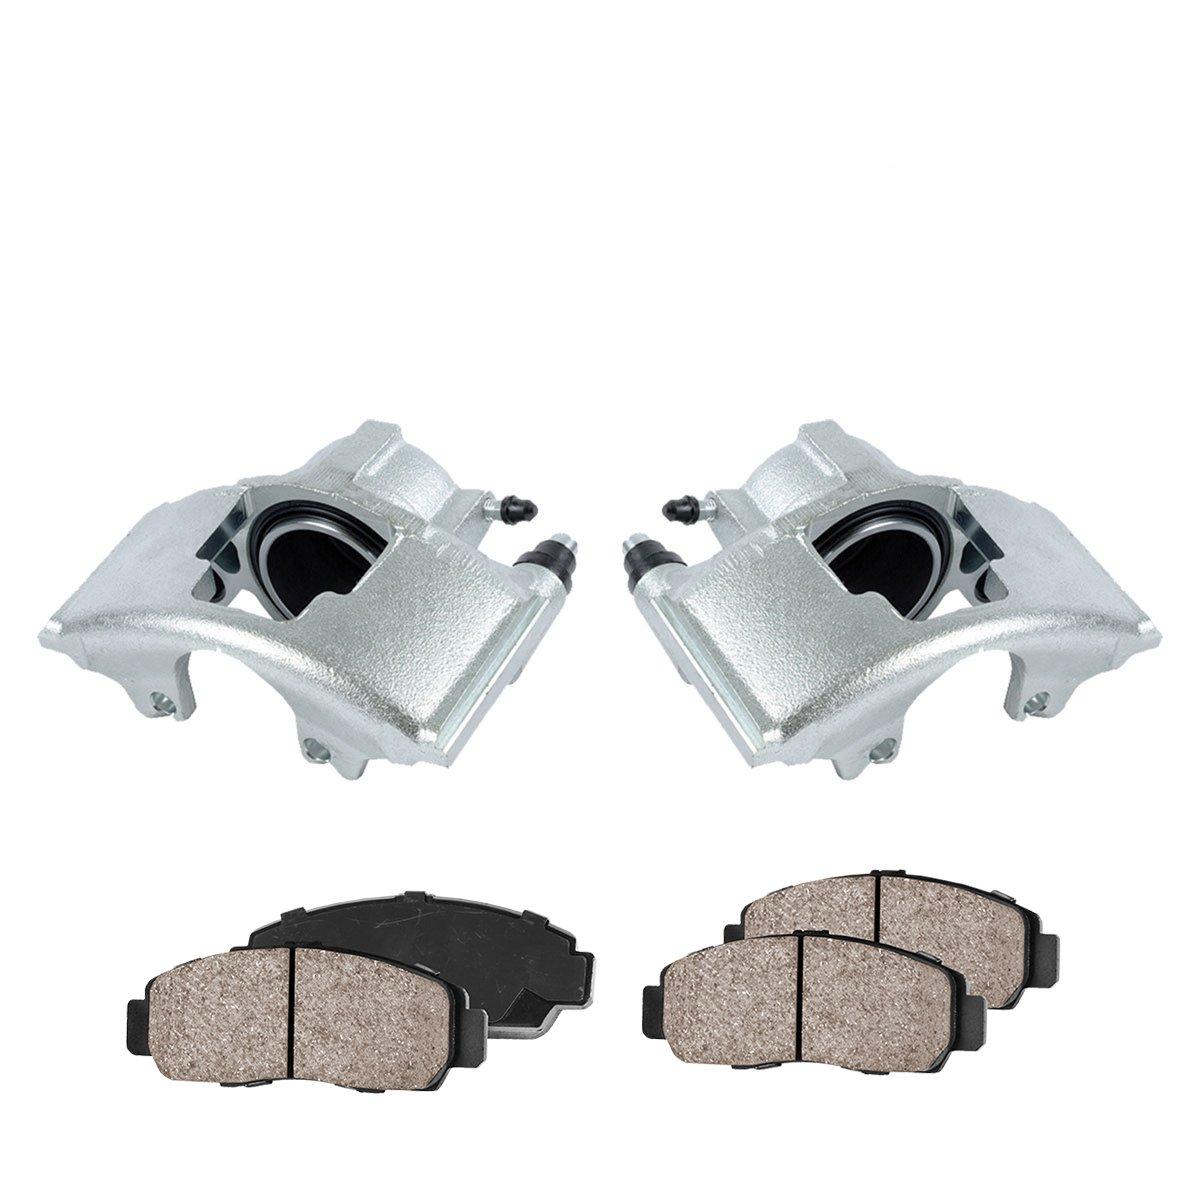 COEK00637 2 FRONT Premium Loaded OE Caliper Assembly Set Quiet Low Dust Ceramic Brake Pads